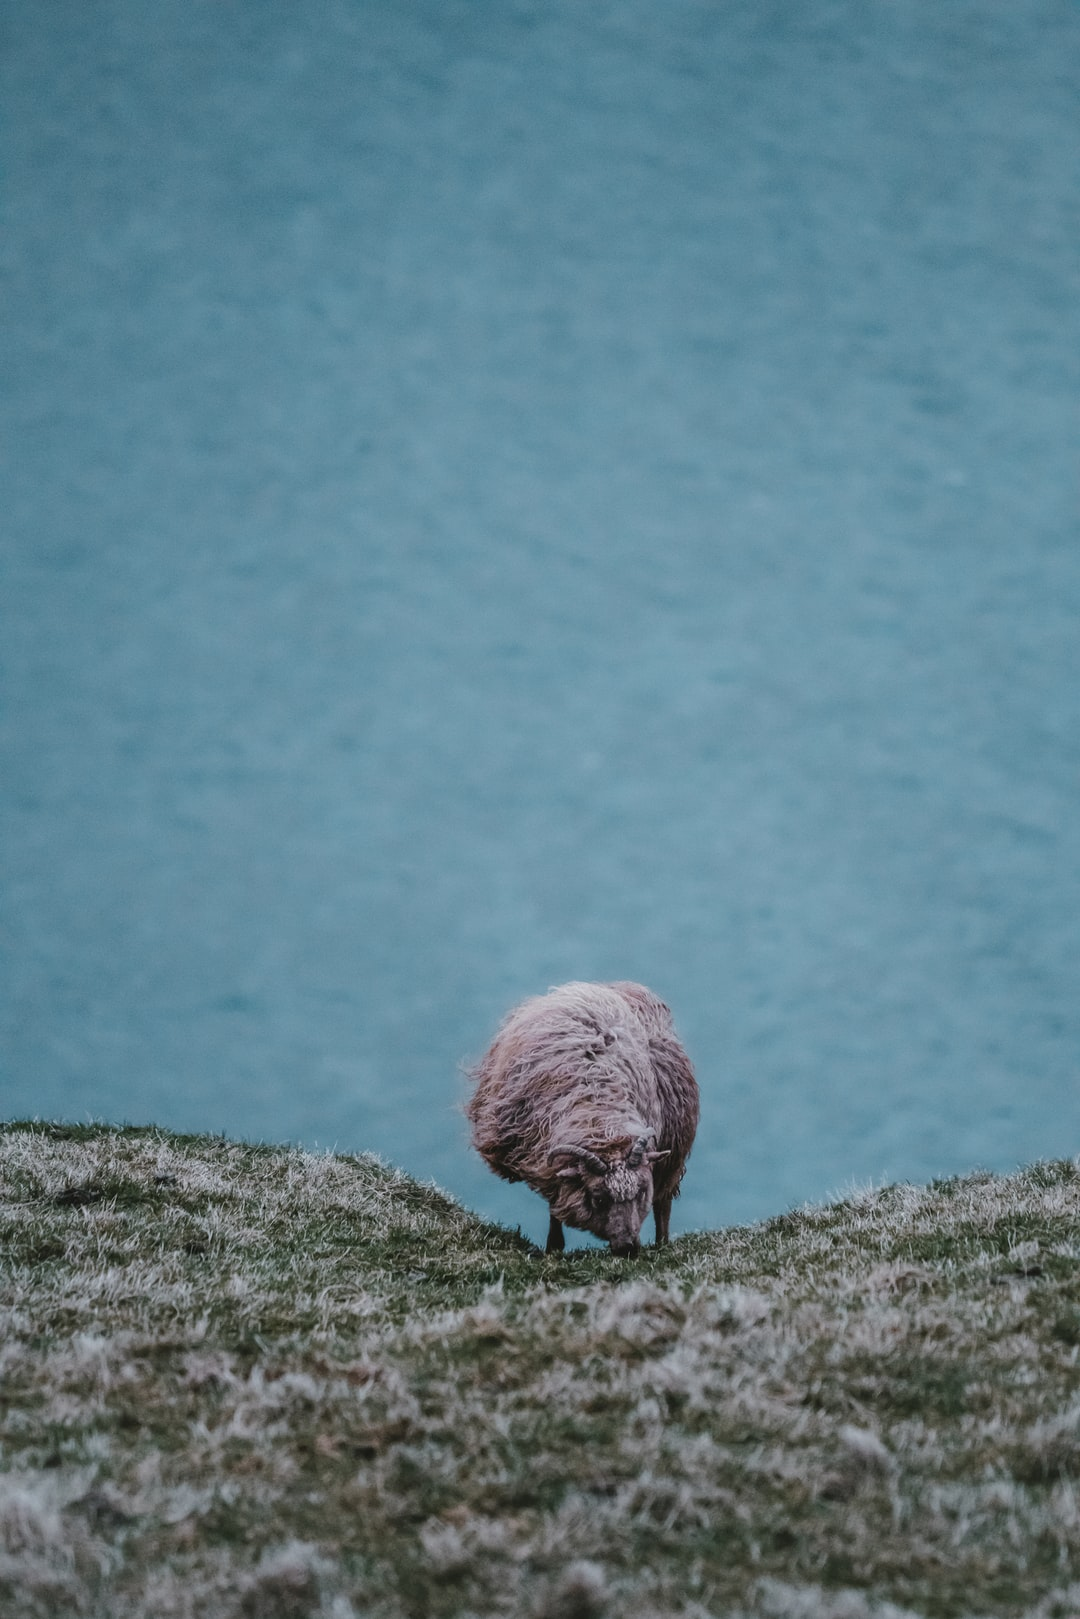 Faroese sheep grazing